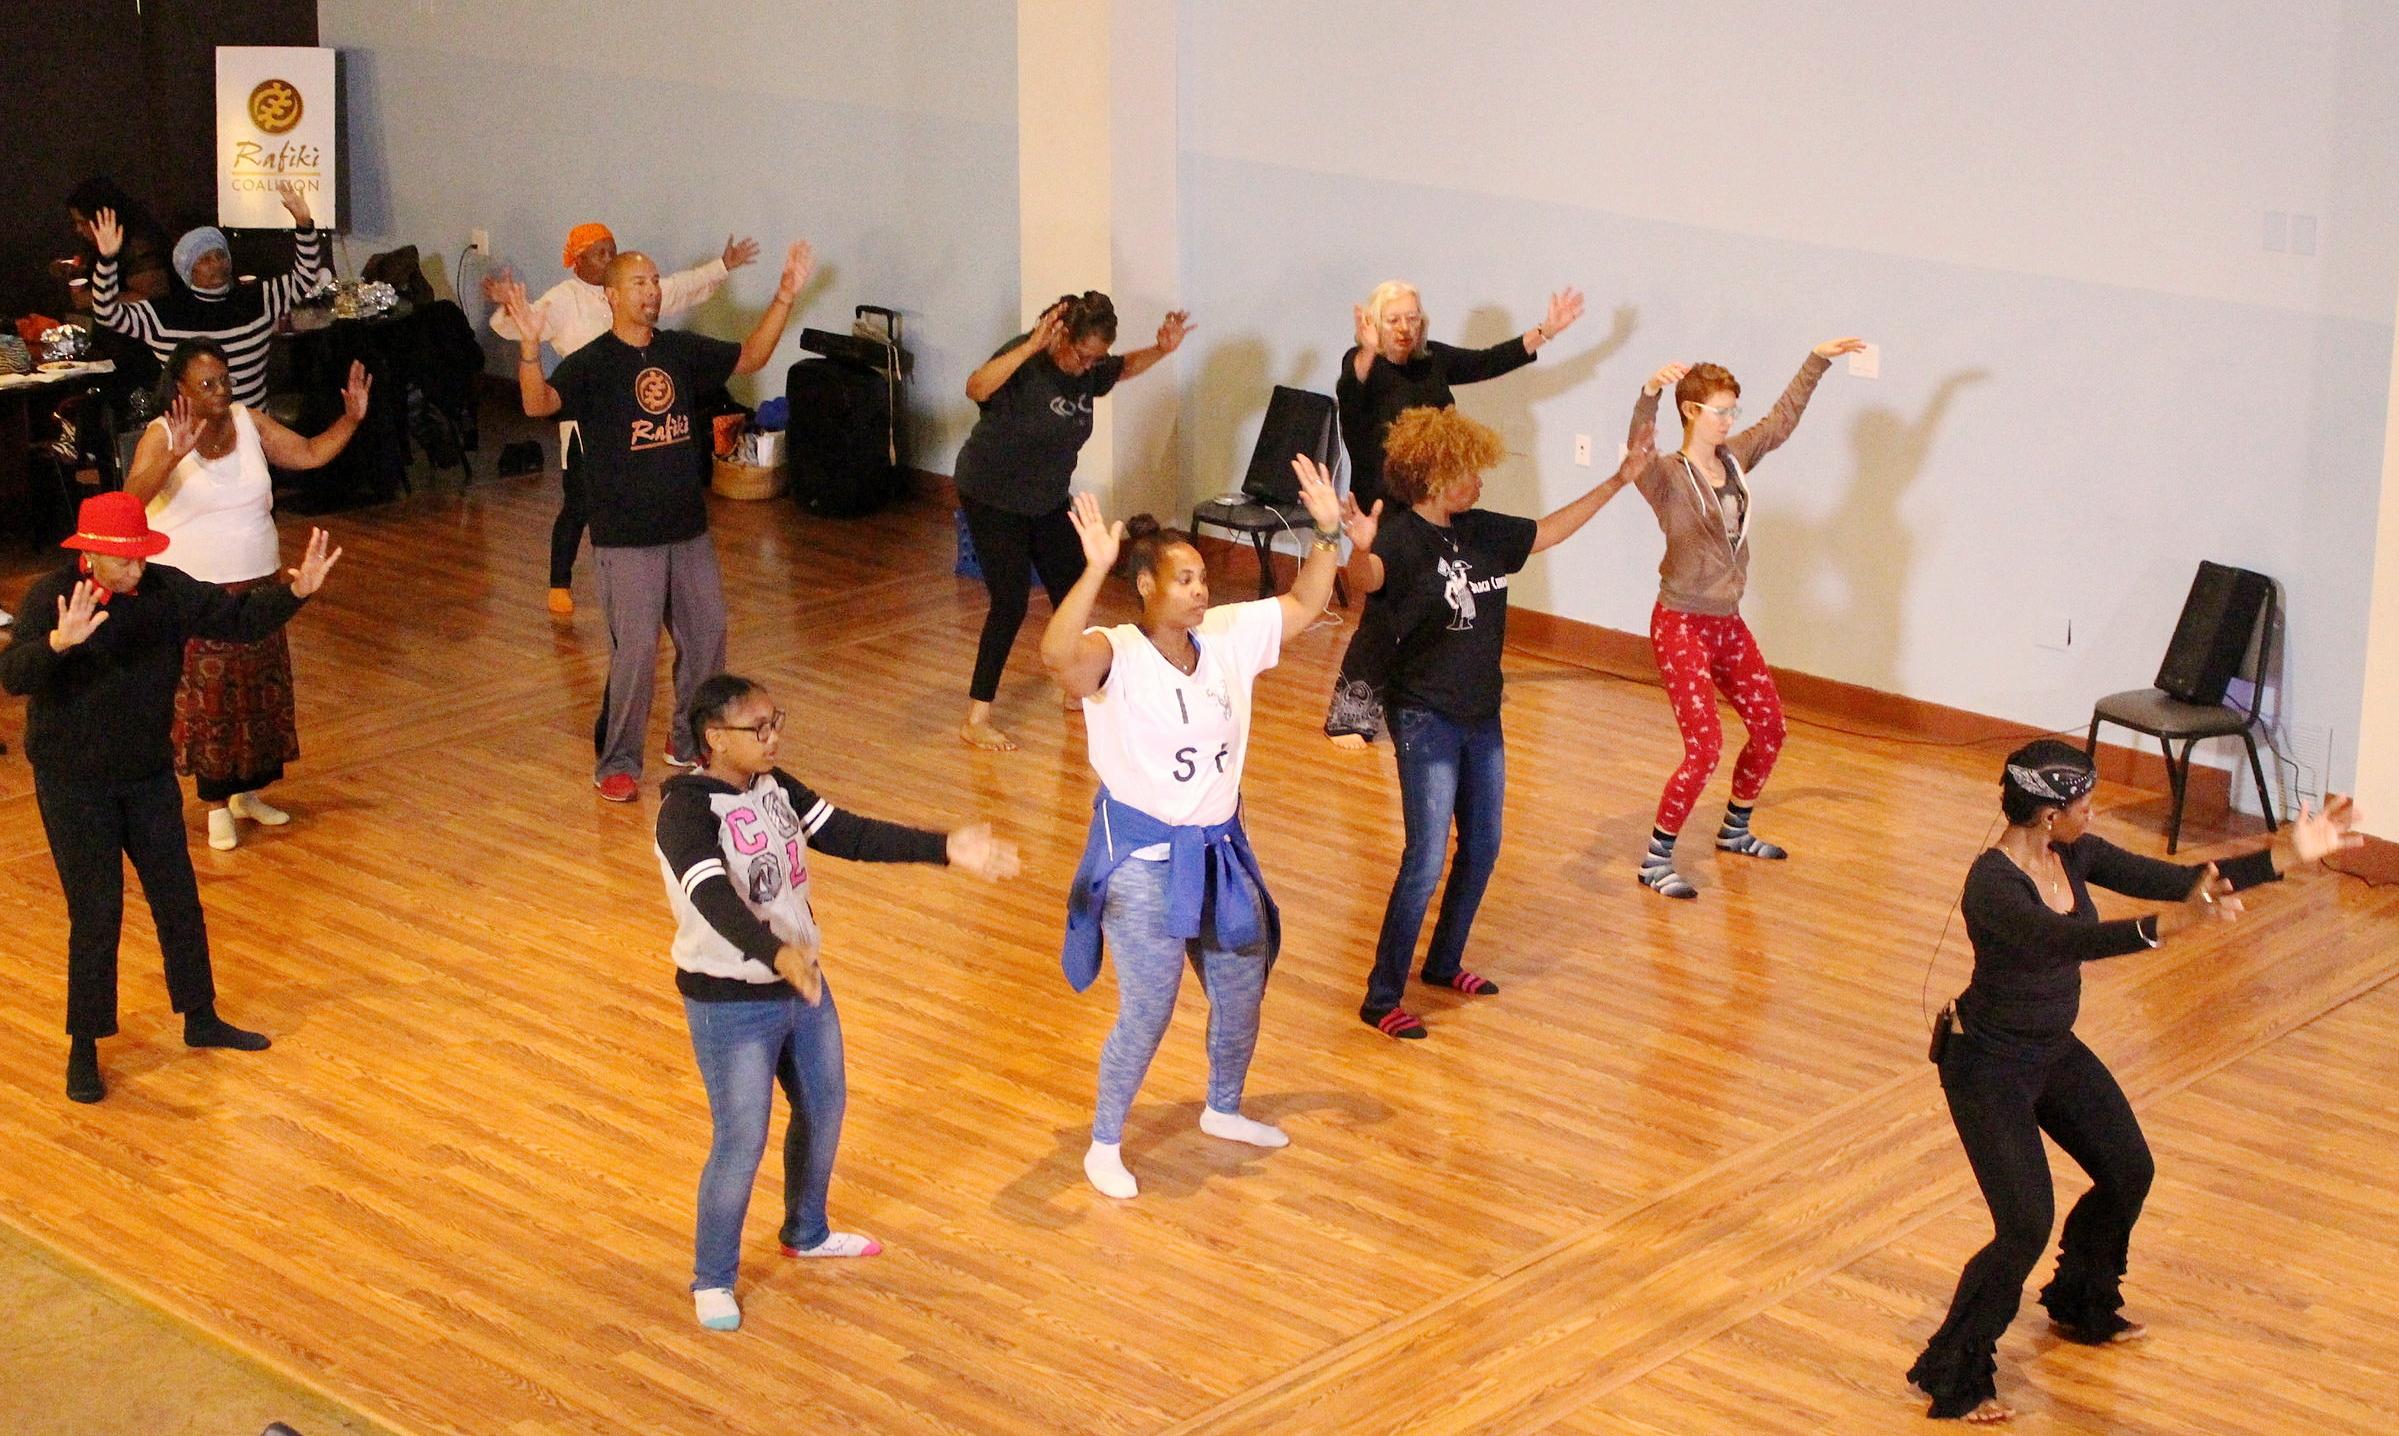 Farcia's Nia class at Rafiki Coalition in San Francisco, CA